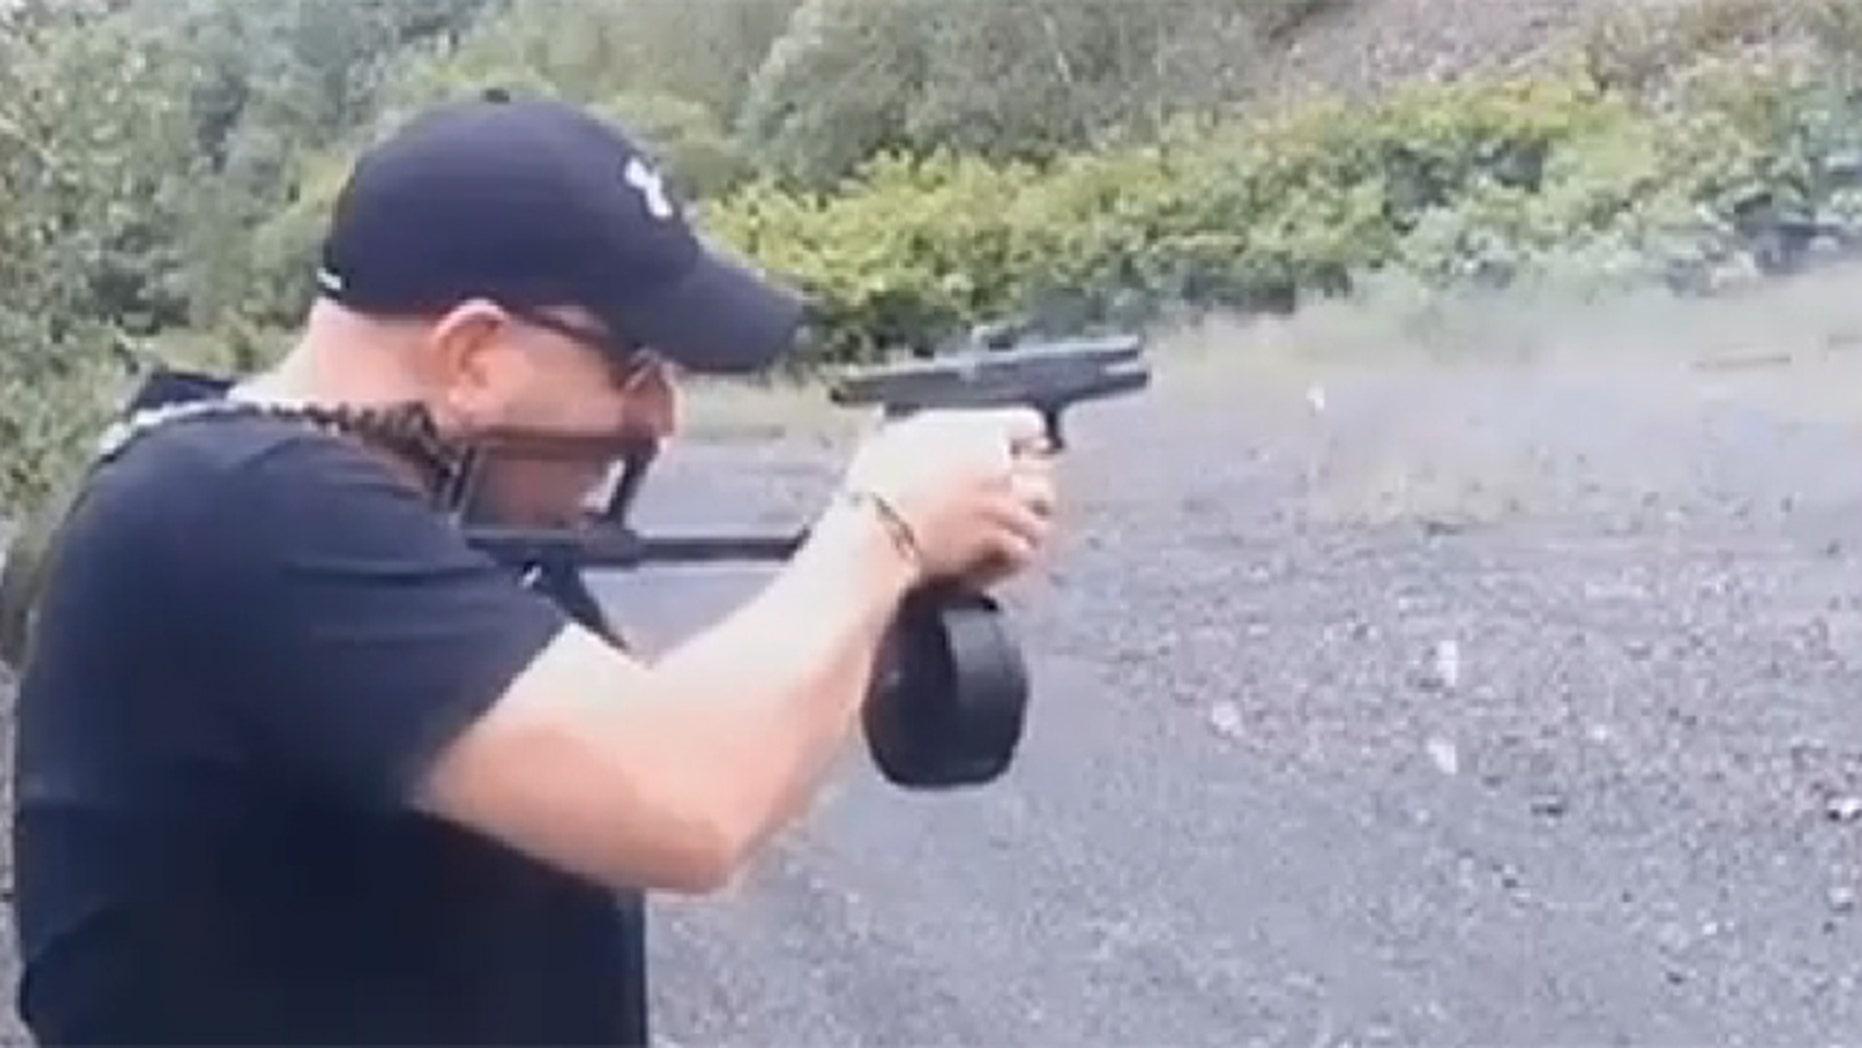 Gilberton police chief Mark Kessler's pro-gun videos have garnered hundreds of thousands of views online.